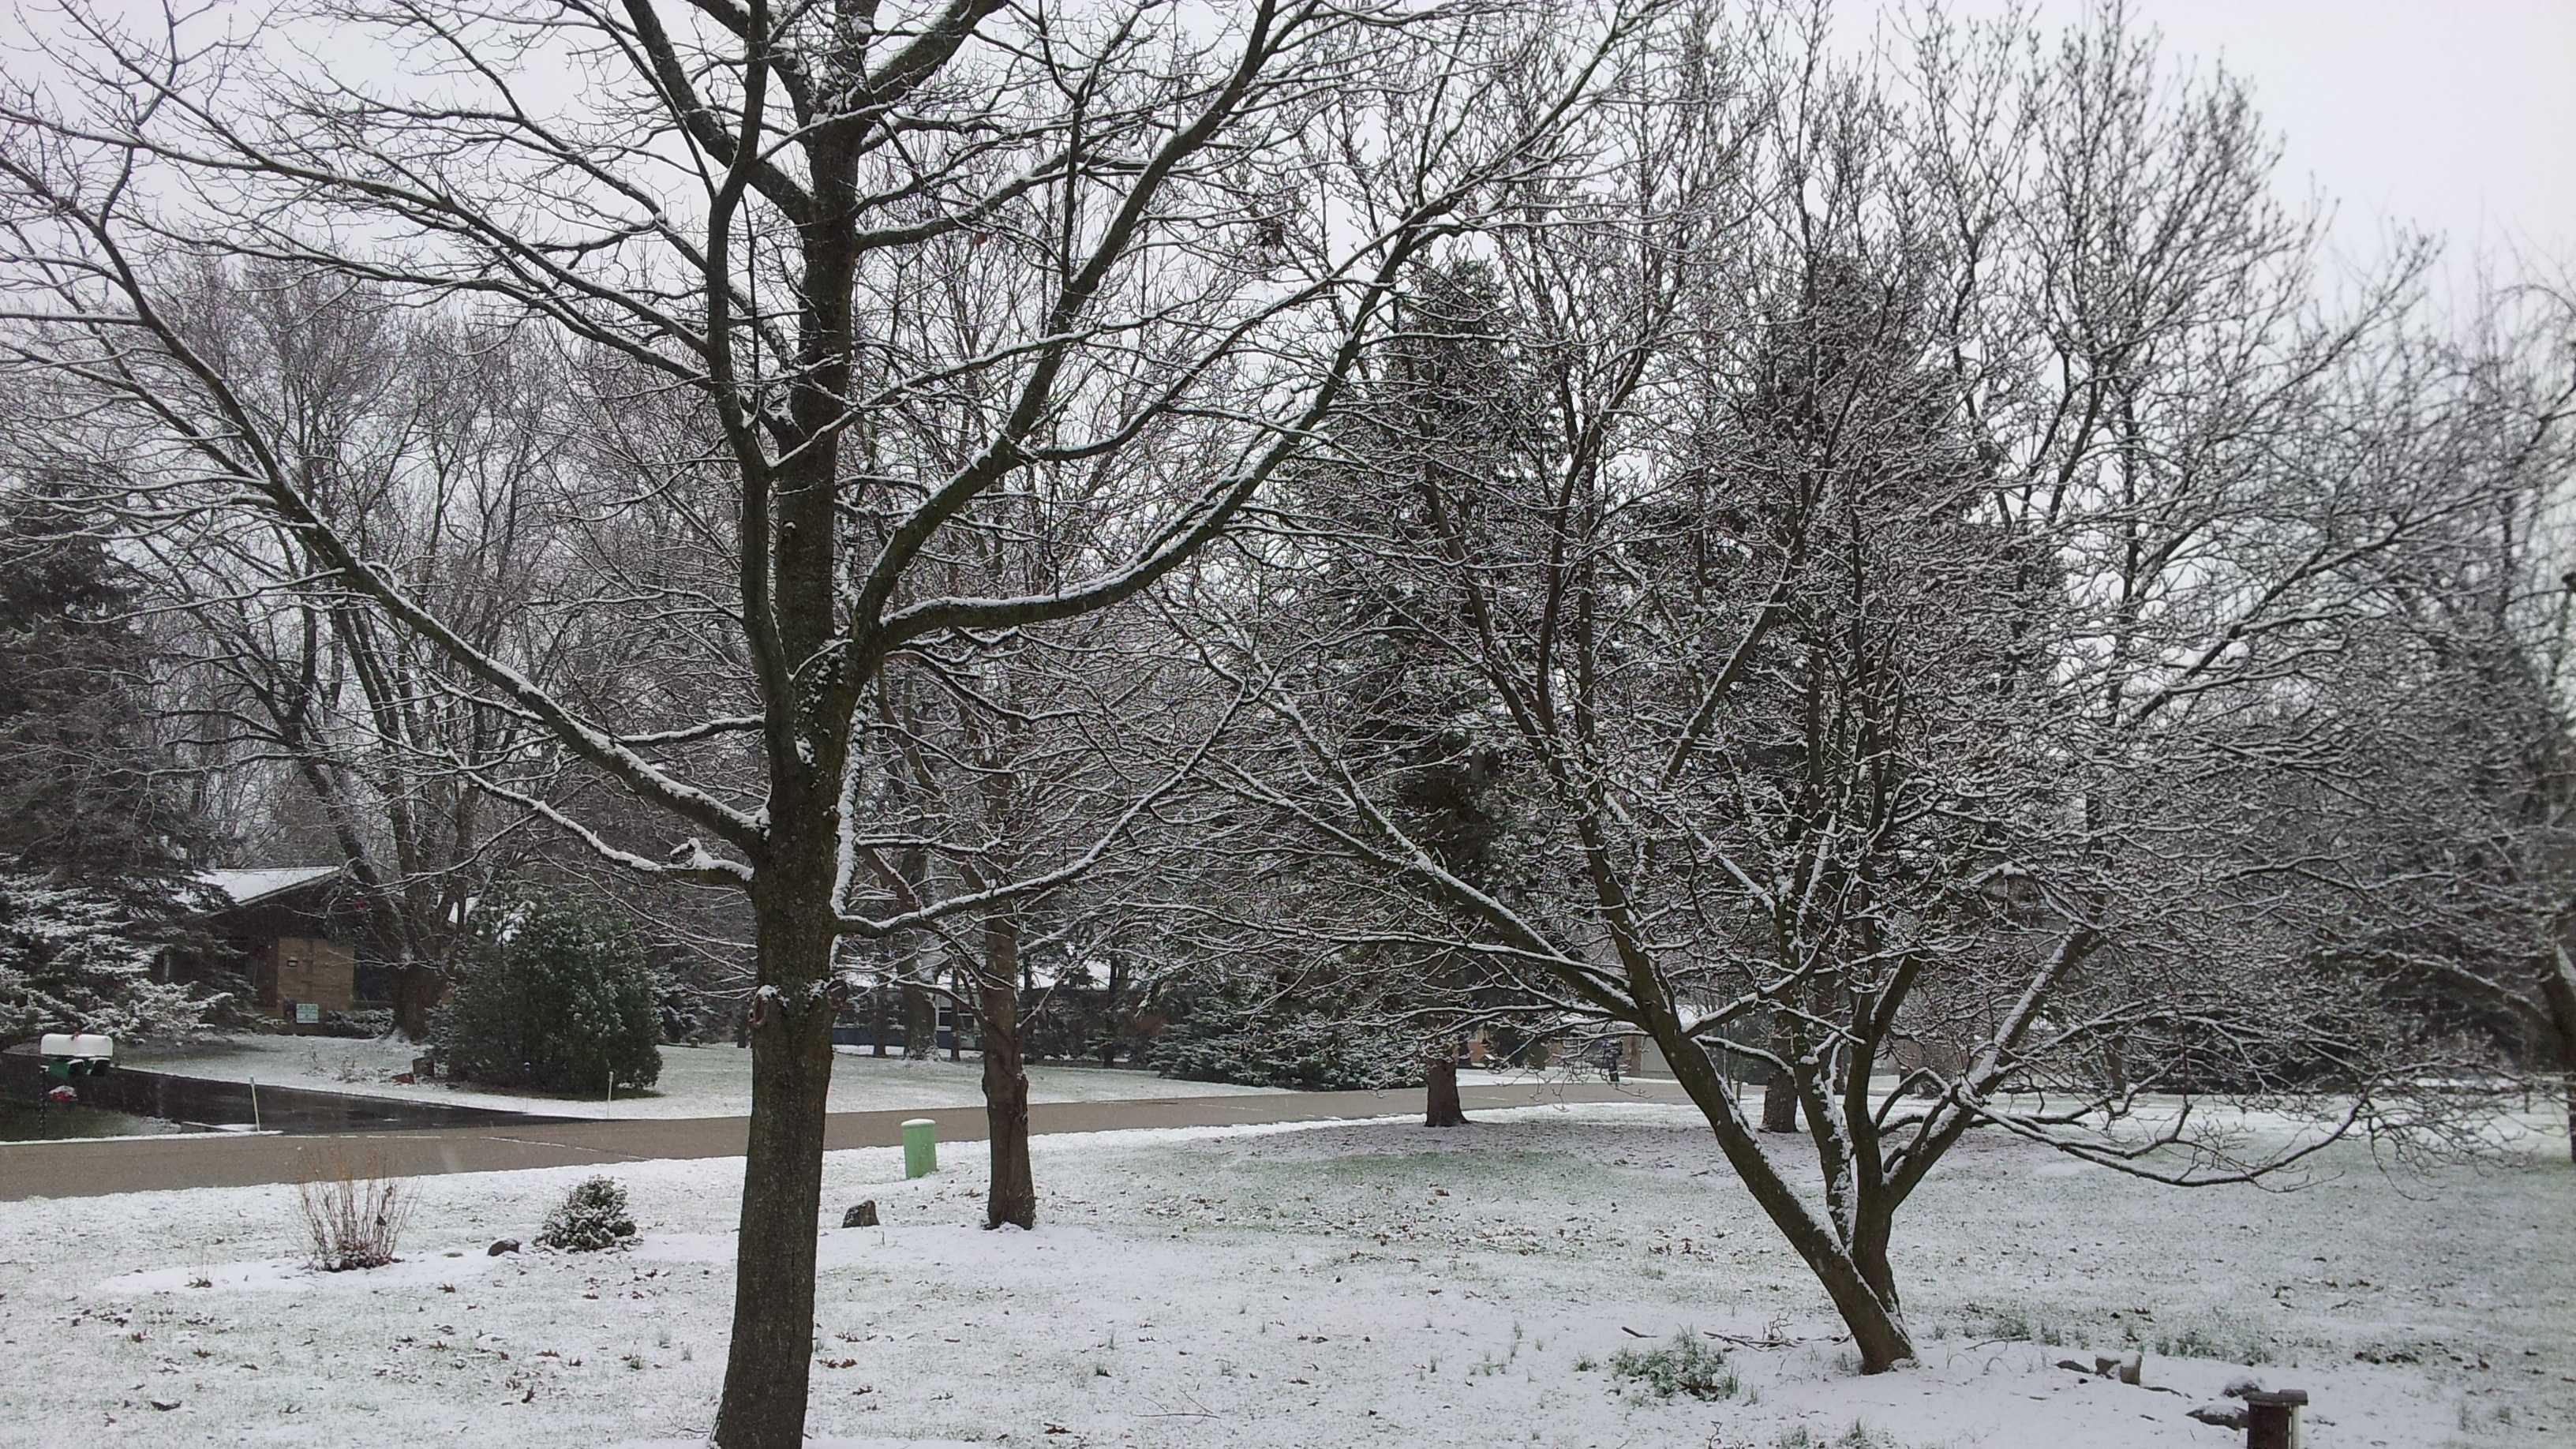 muskego snow 3.jpg